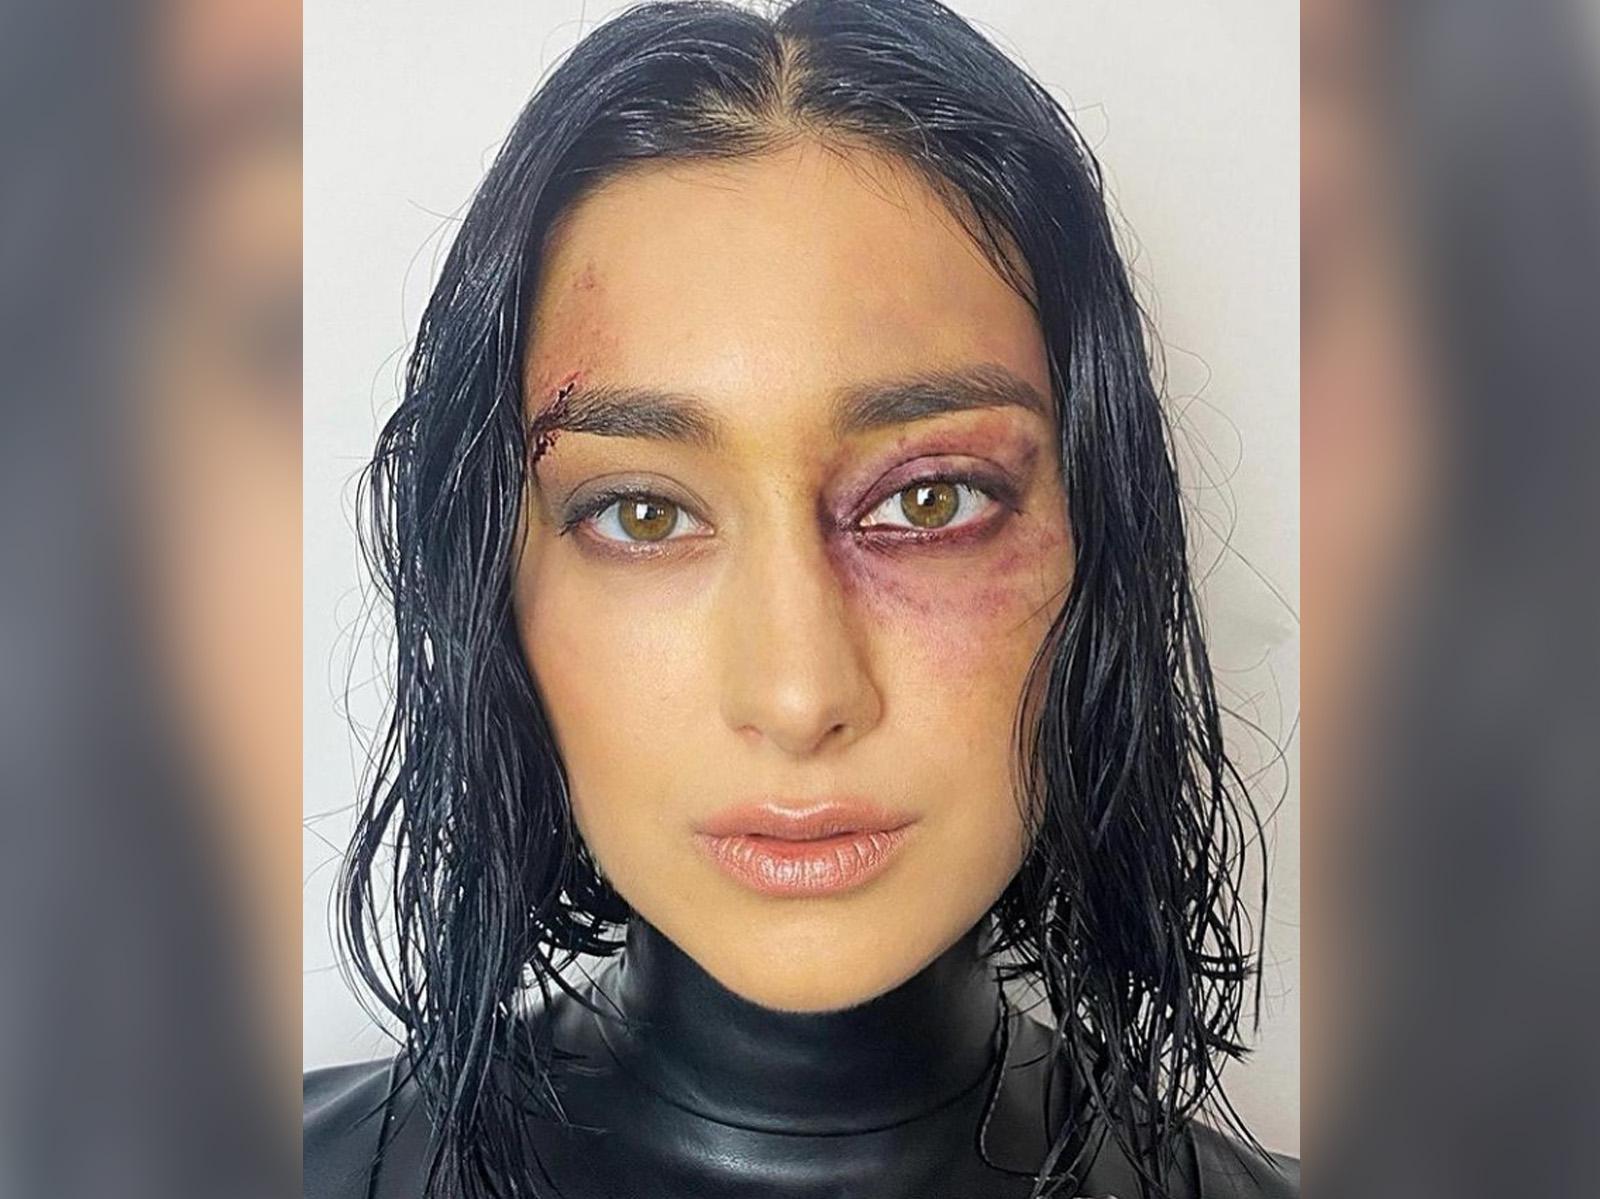 Lena meyer-landrut gehackt